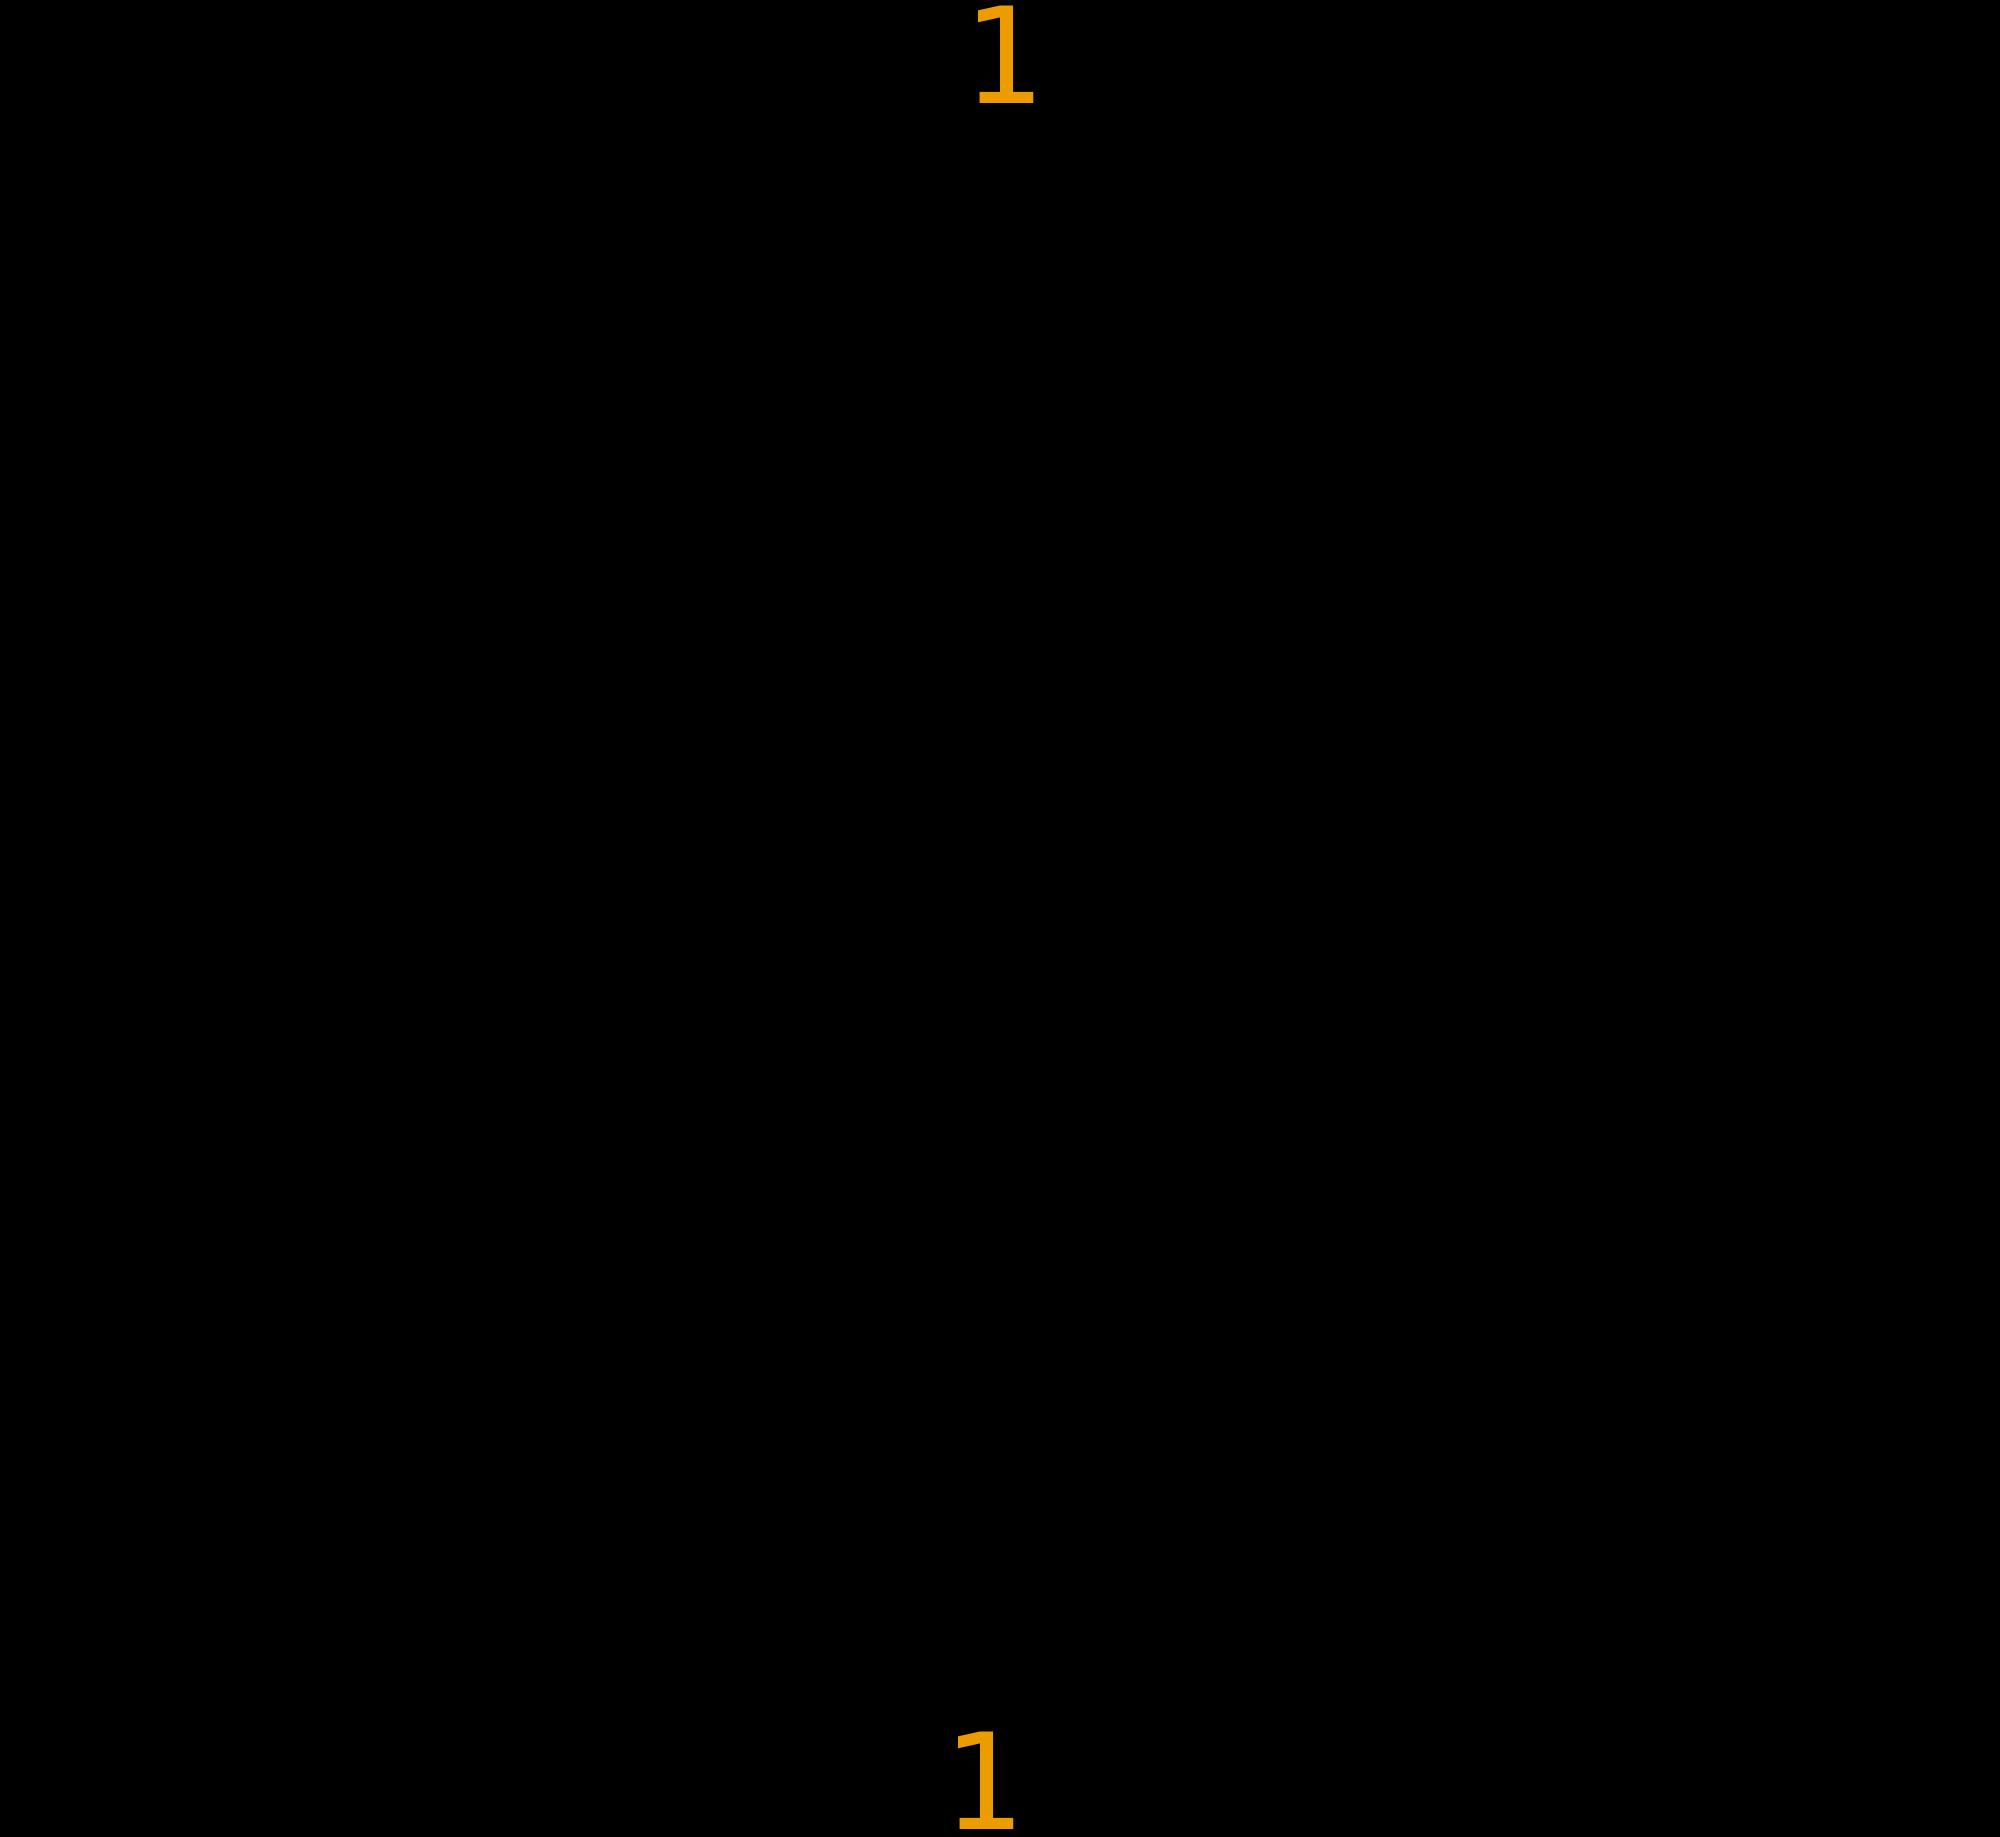 Film frame png. Black and white strip